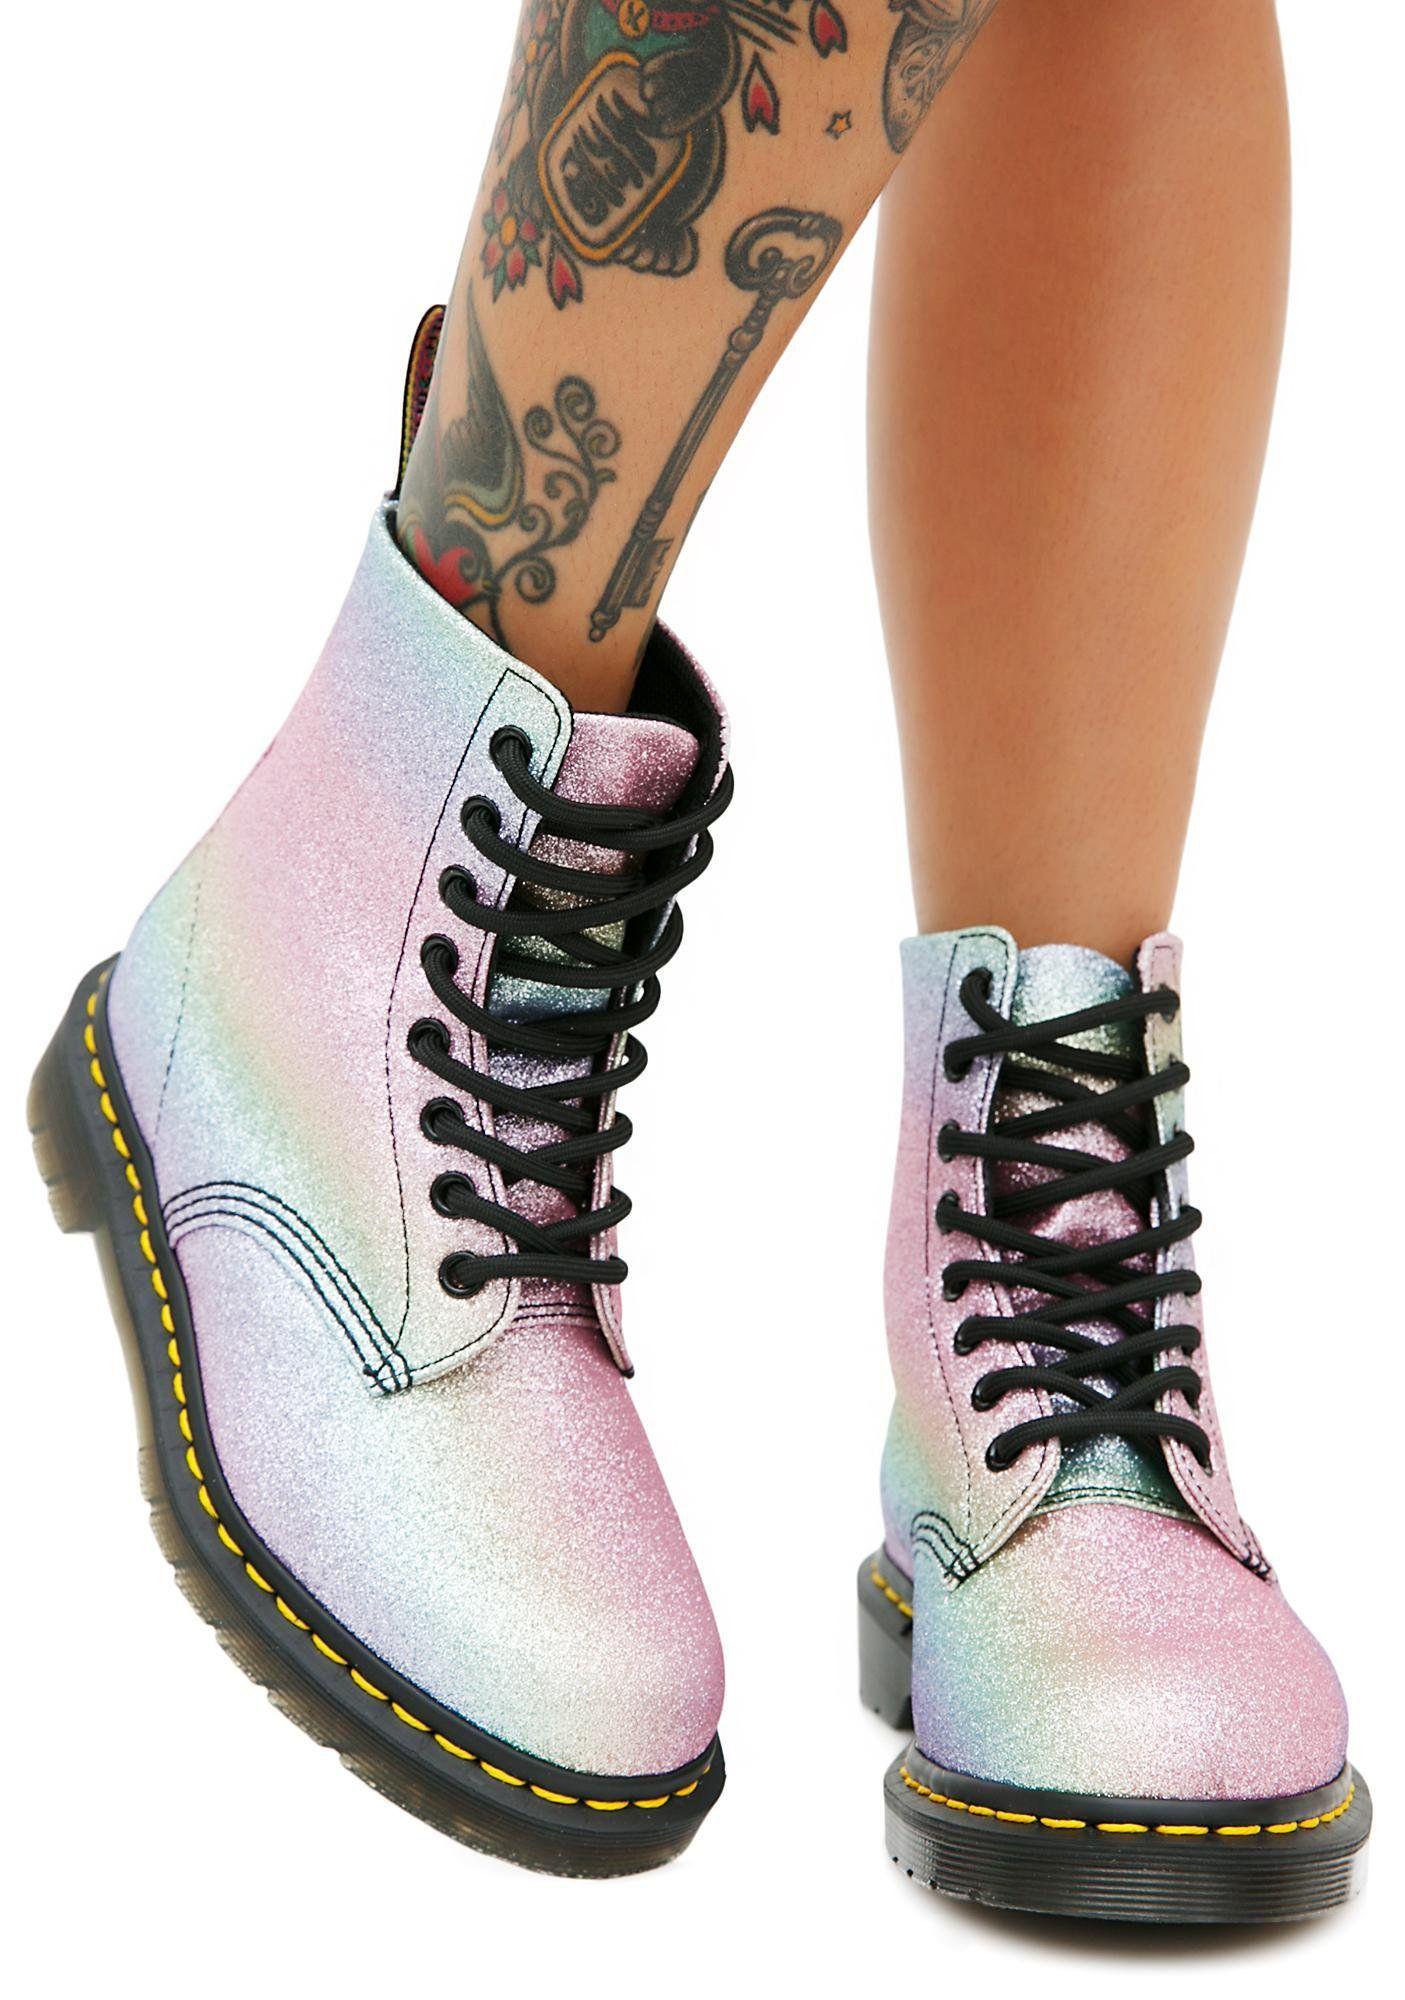 4ee5f7e3a04d7 Dr. Martens Rainbow Glitter Pascal Boots at Dolls Kill, an online punk, goth